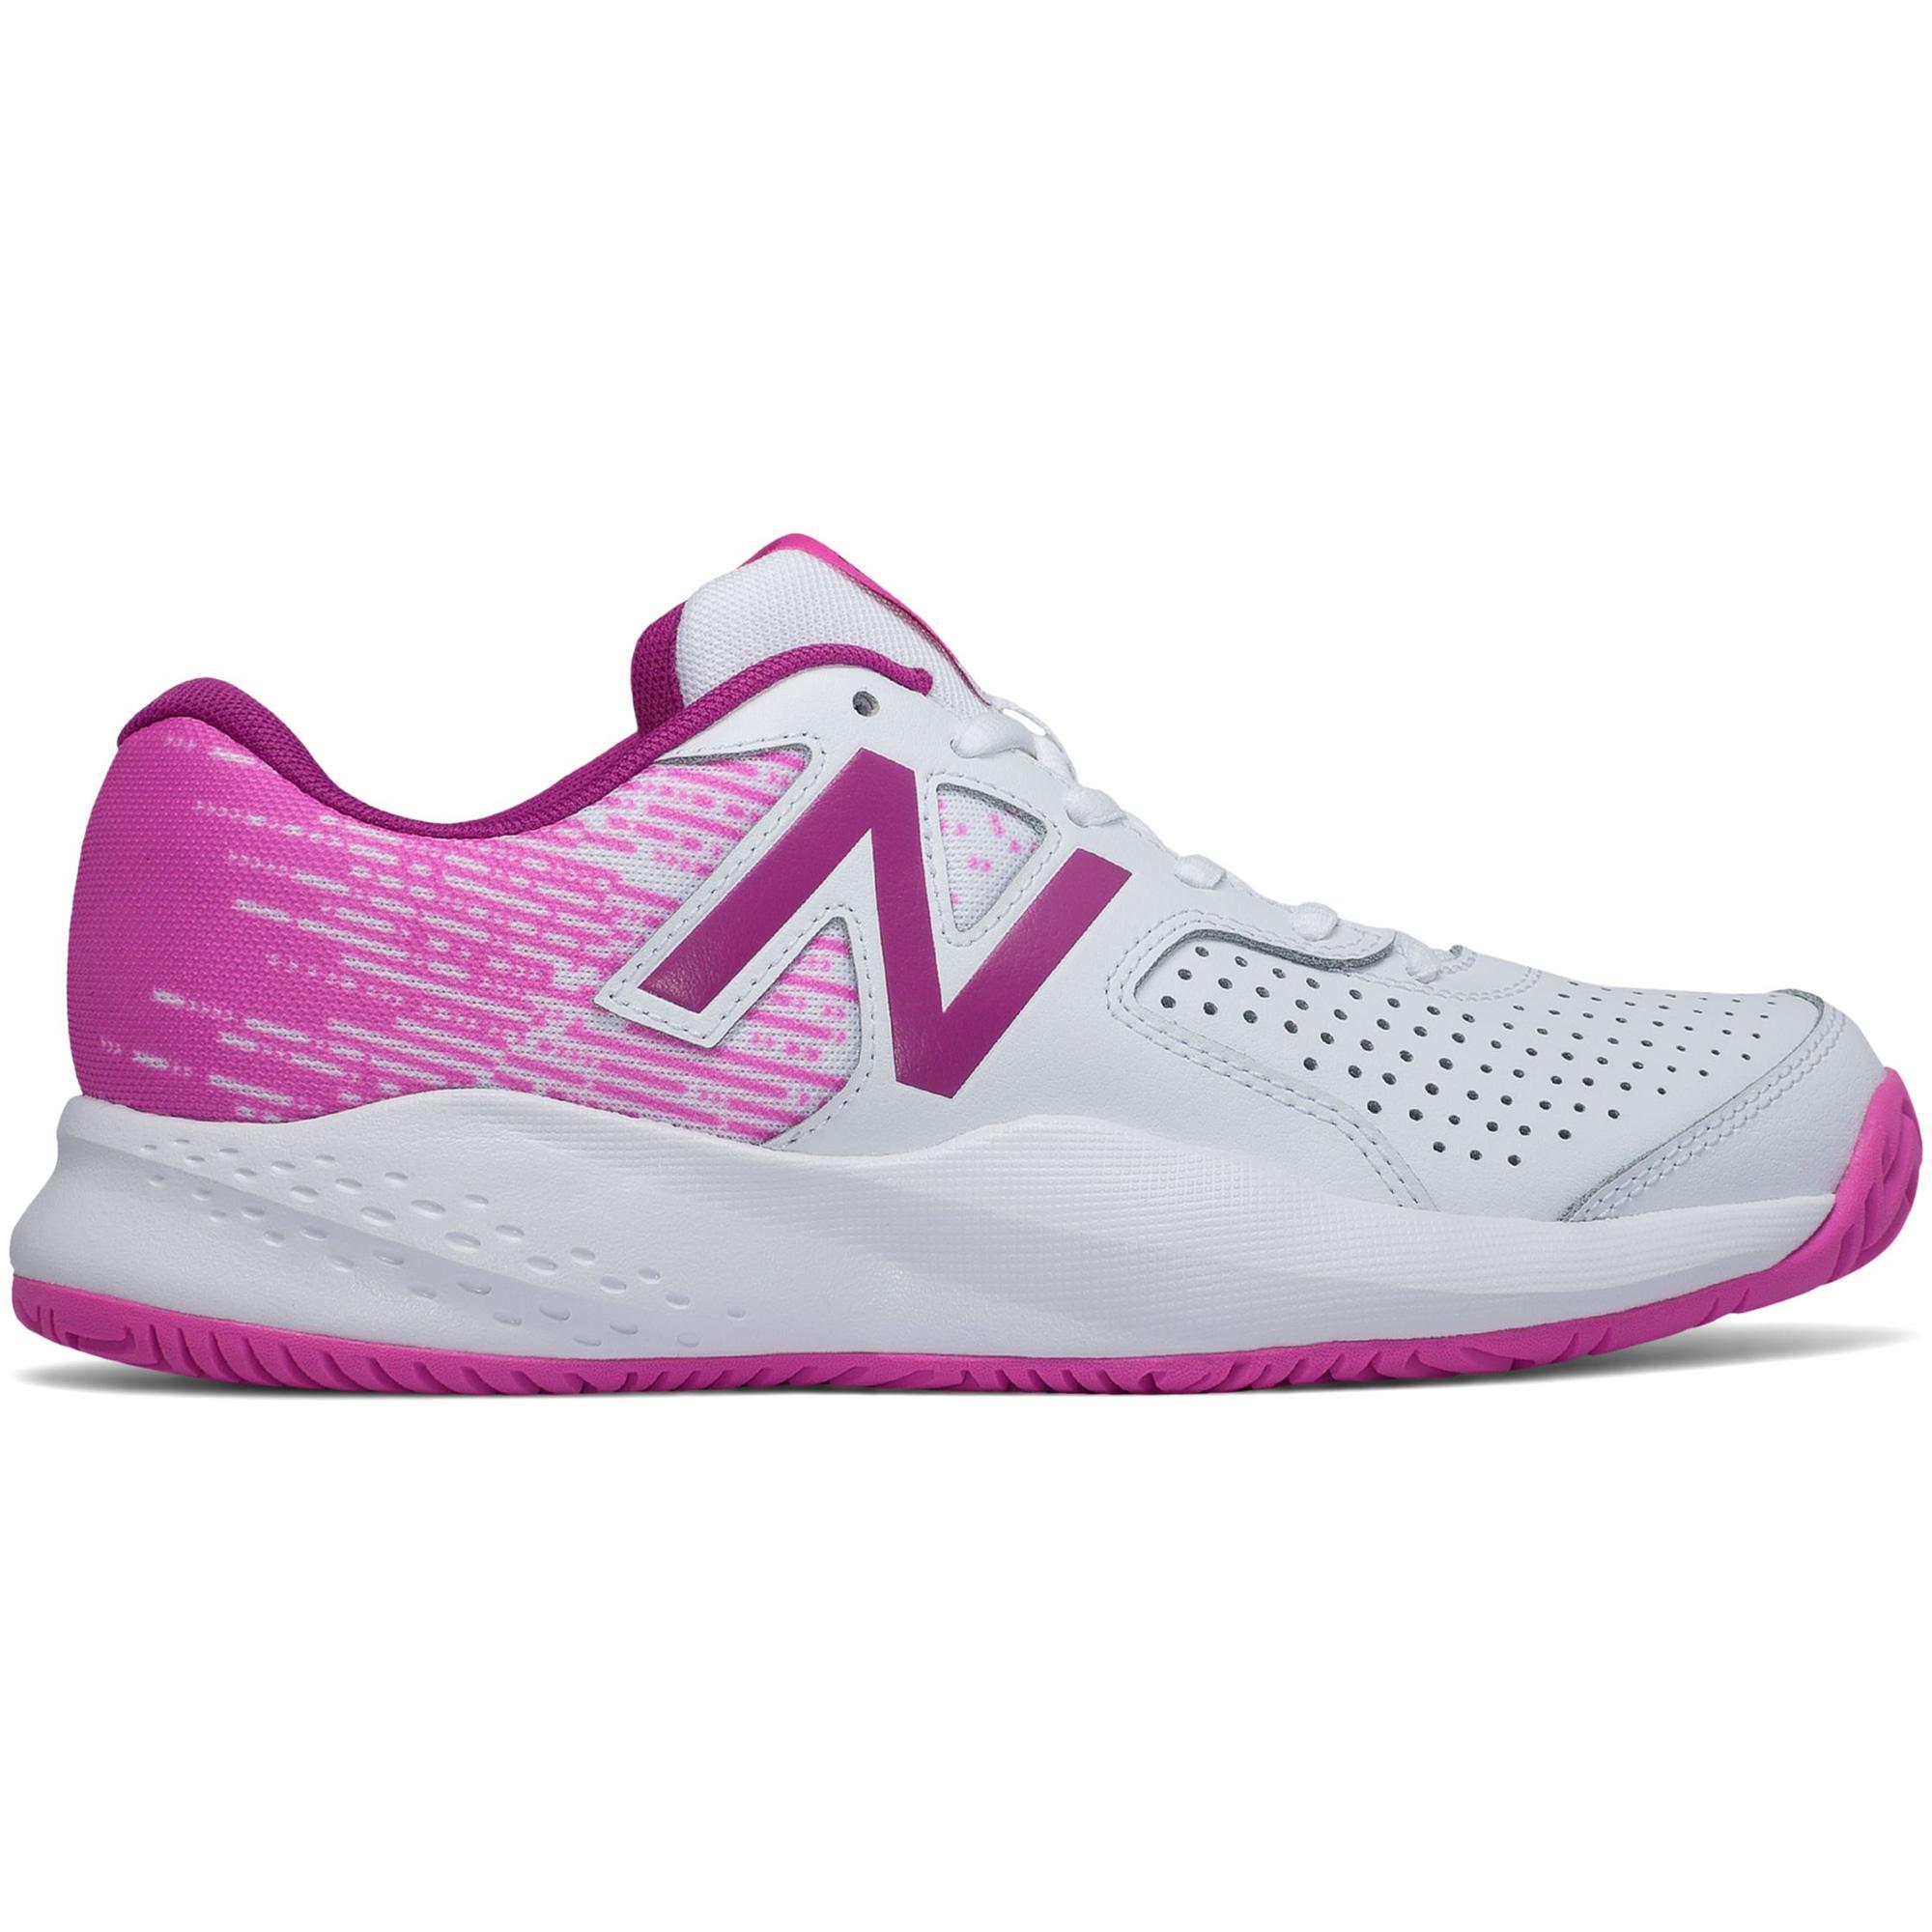 New Balance Womens 696v3 Tennis Shoes - White/Pink ...